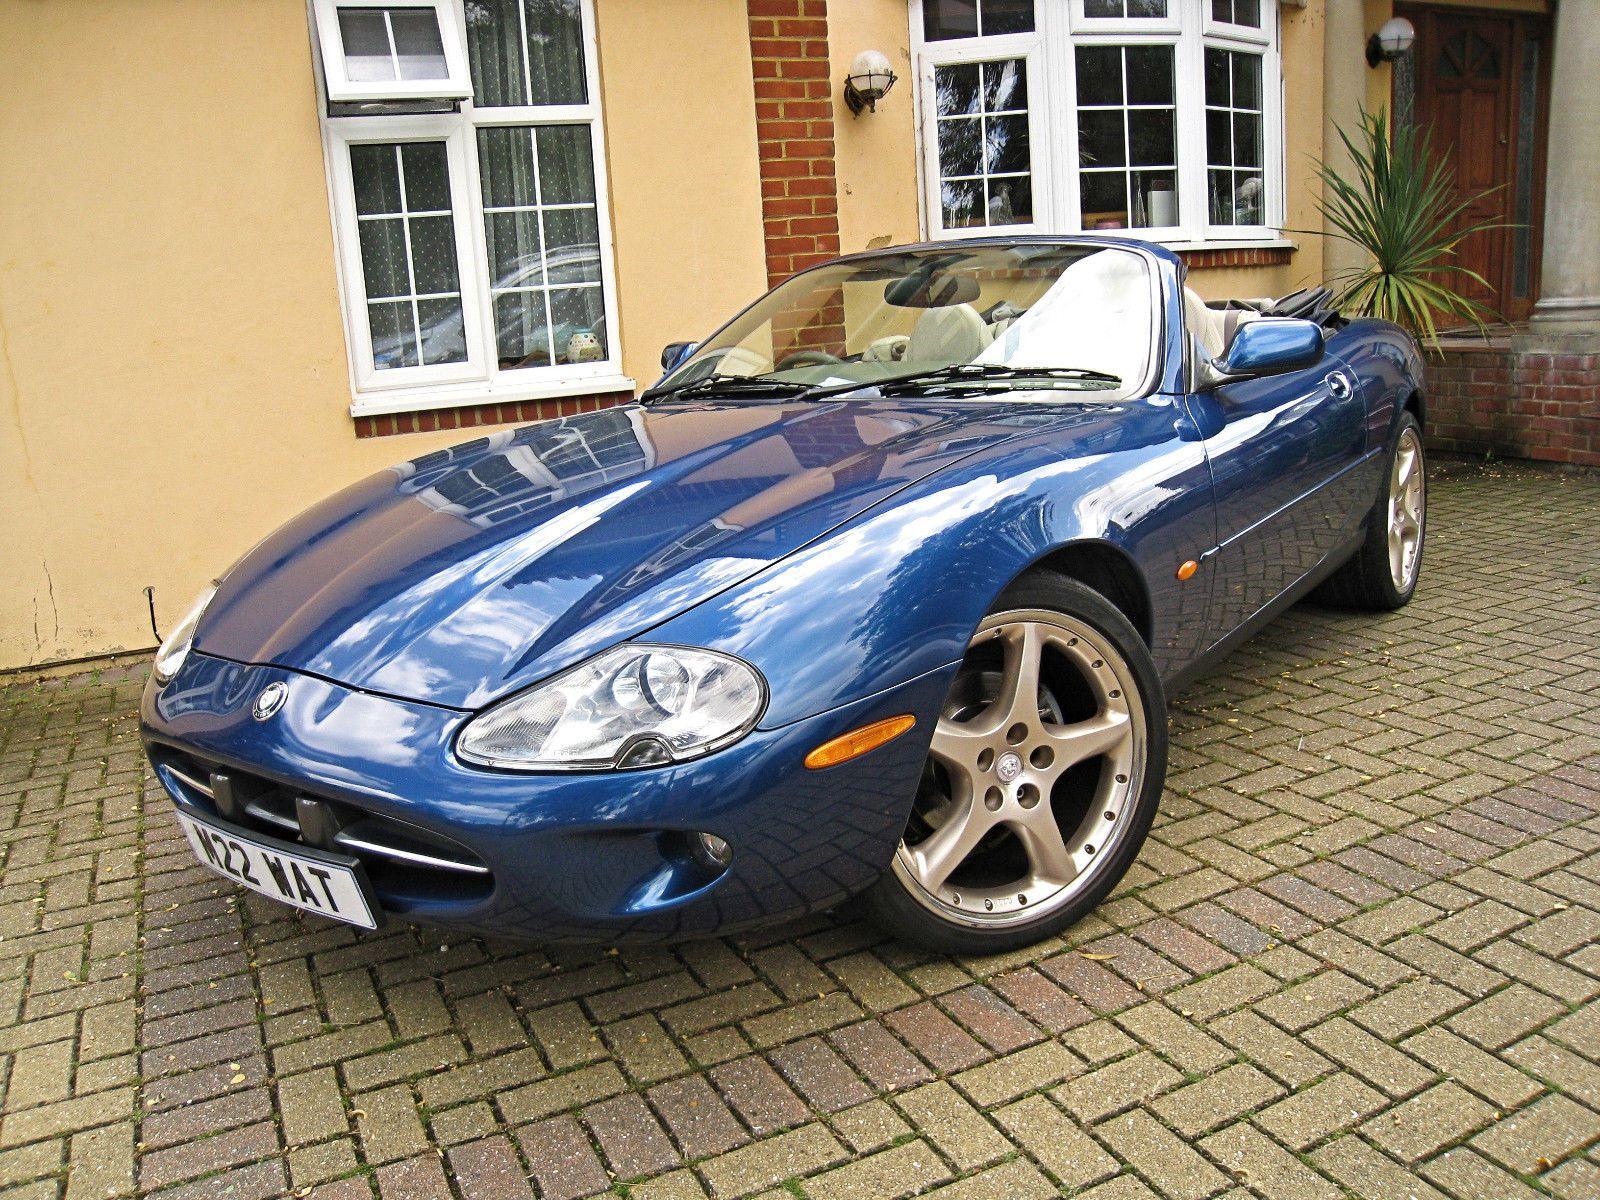 1997 jaguar xk8 40 convertible 290 bhp leather royal blue